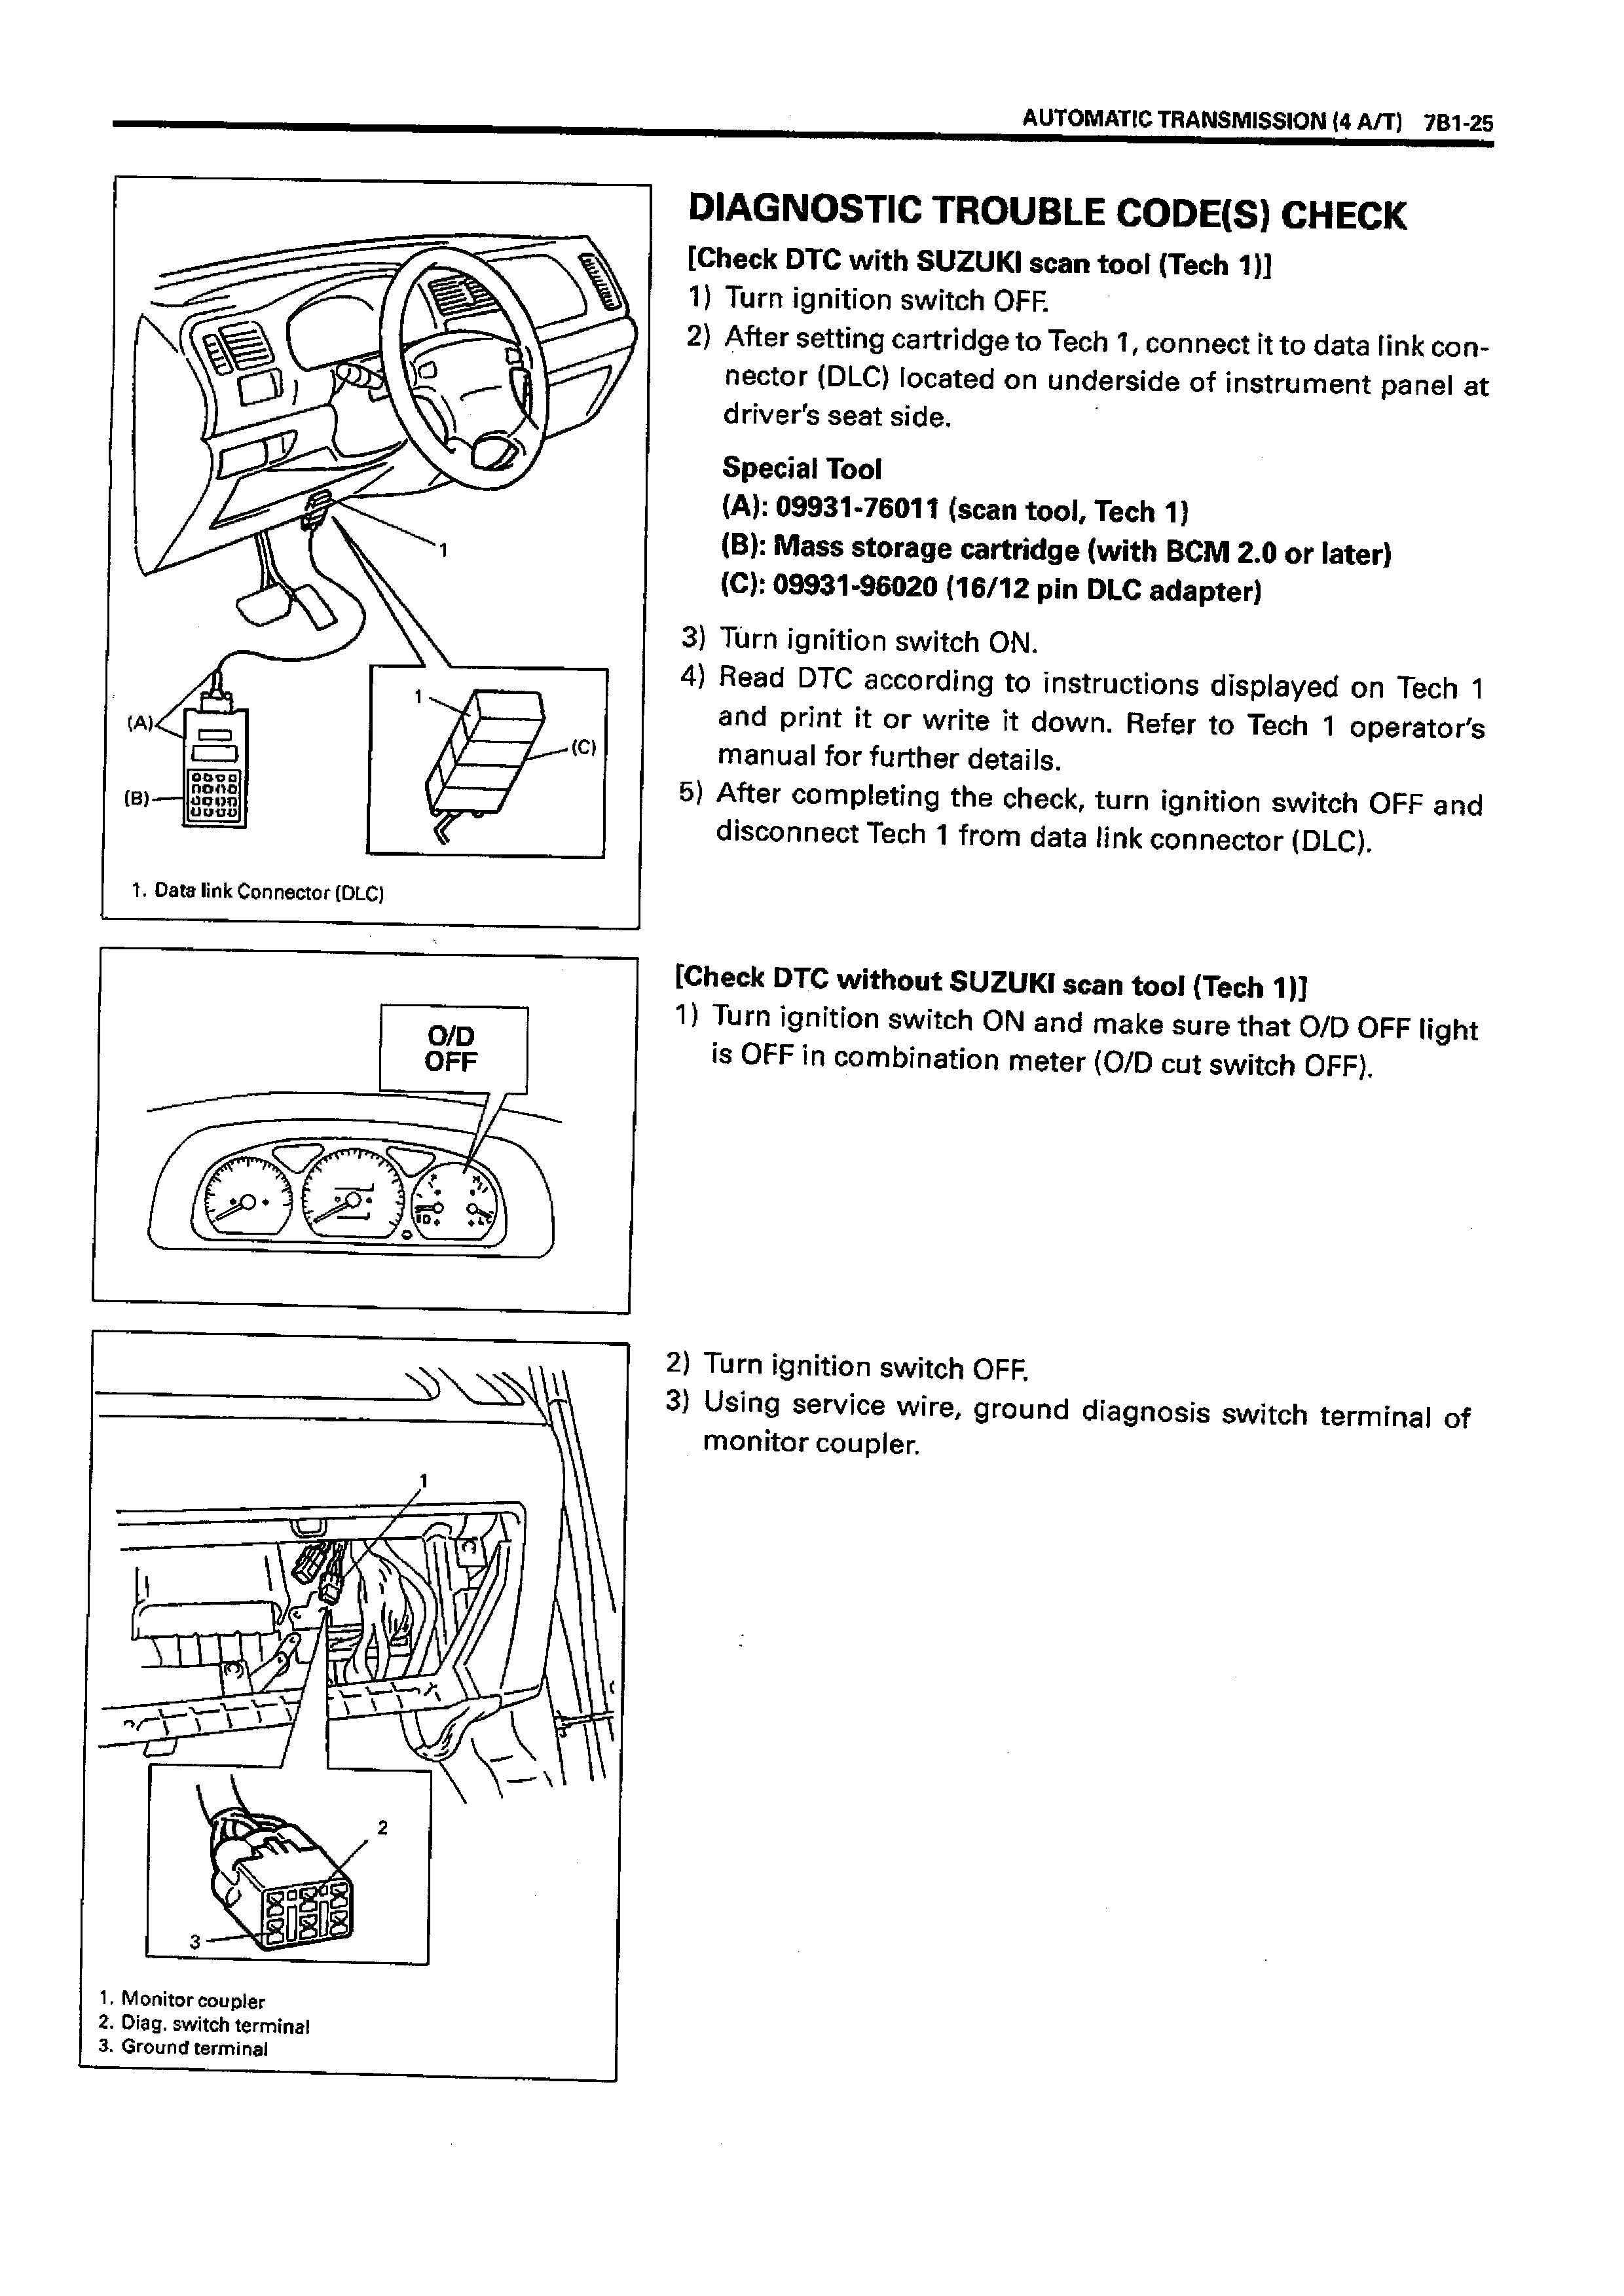 Wiring Diagram Suzuki Wagon R K10a Books Of Diagrams 2001 Esteem Fuse Box Water Pump Replacement